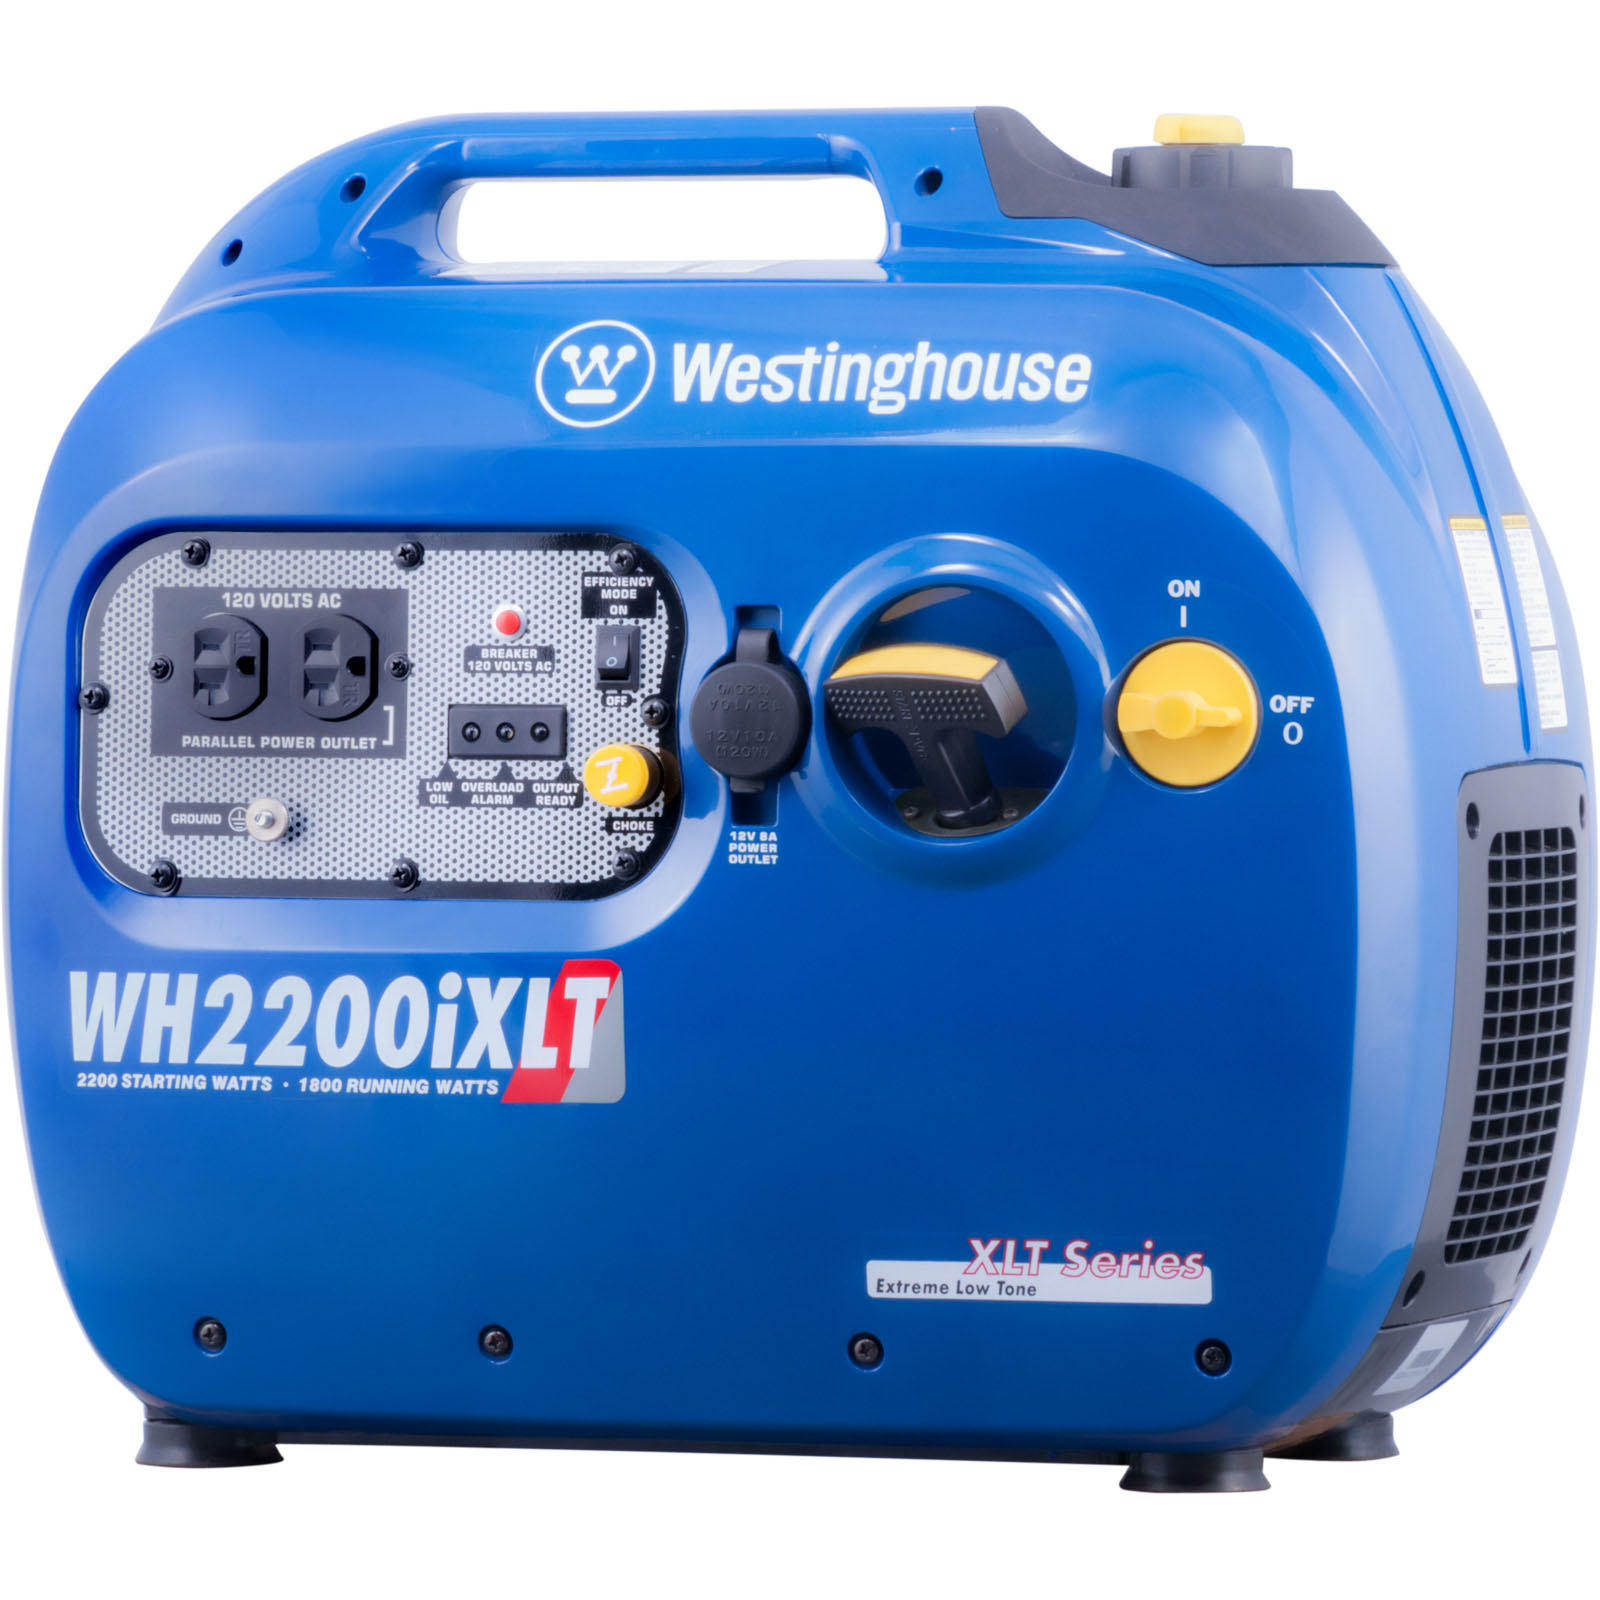 2200 Watt Peak 1800 Watt Running Gasoline Powered Digital Inverter Generator with Parallel Capabilities by Westinghouse